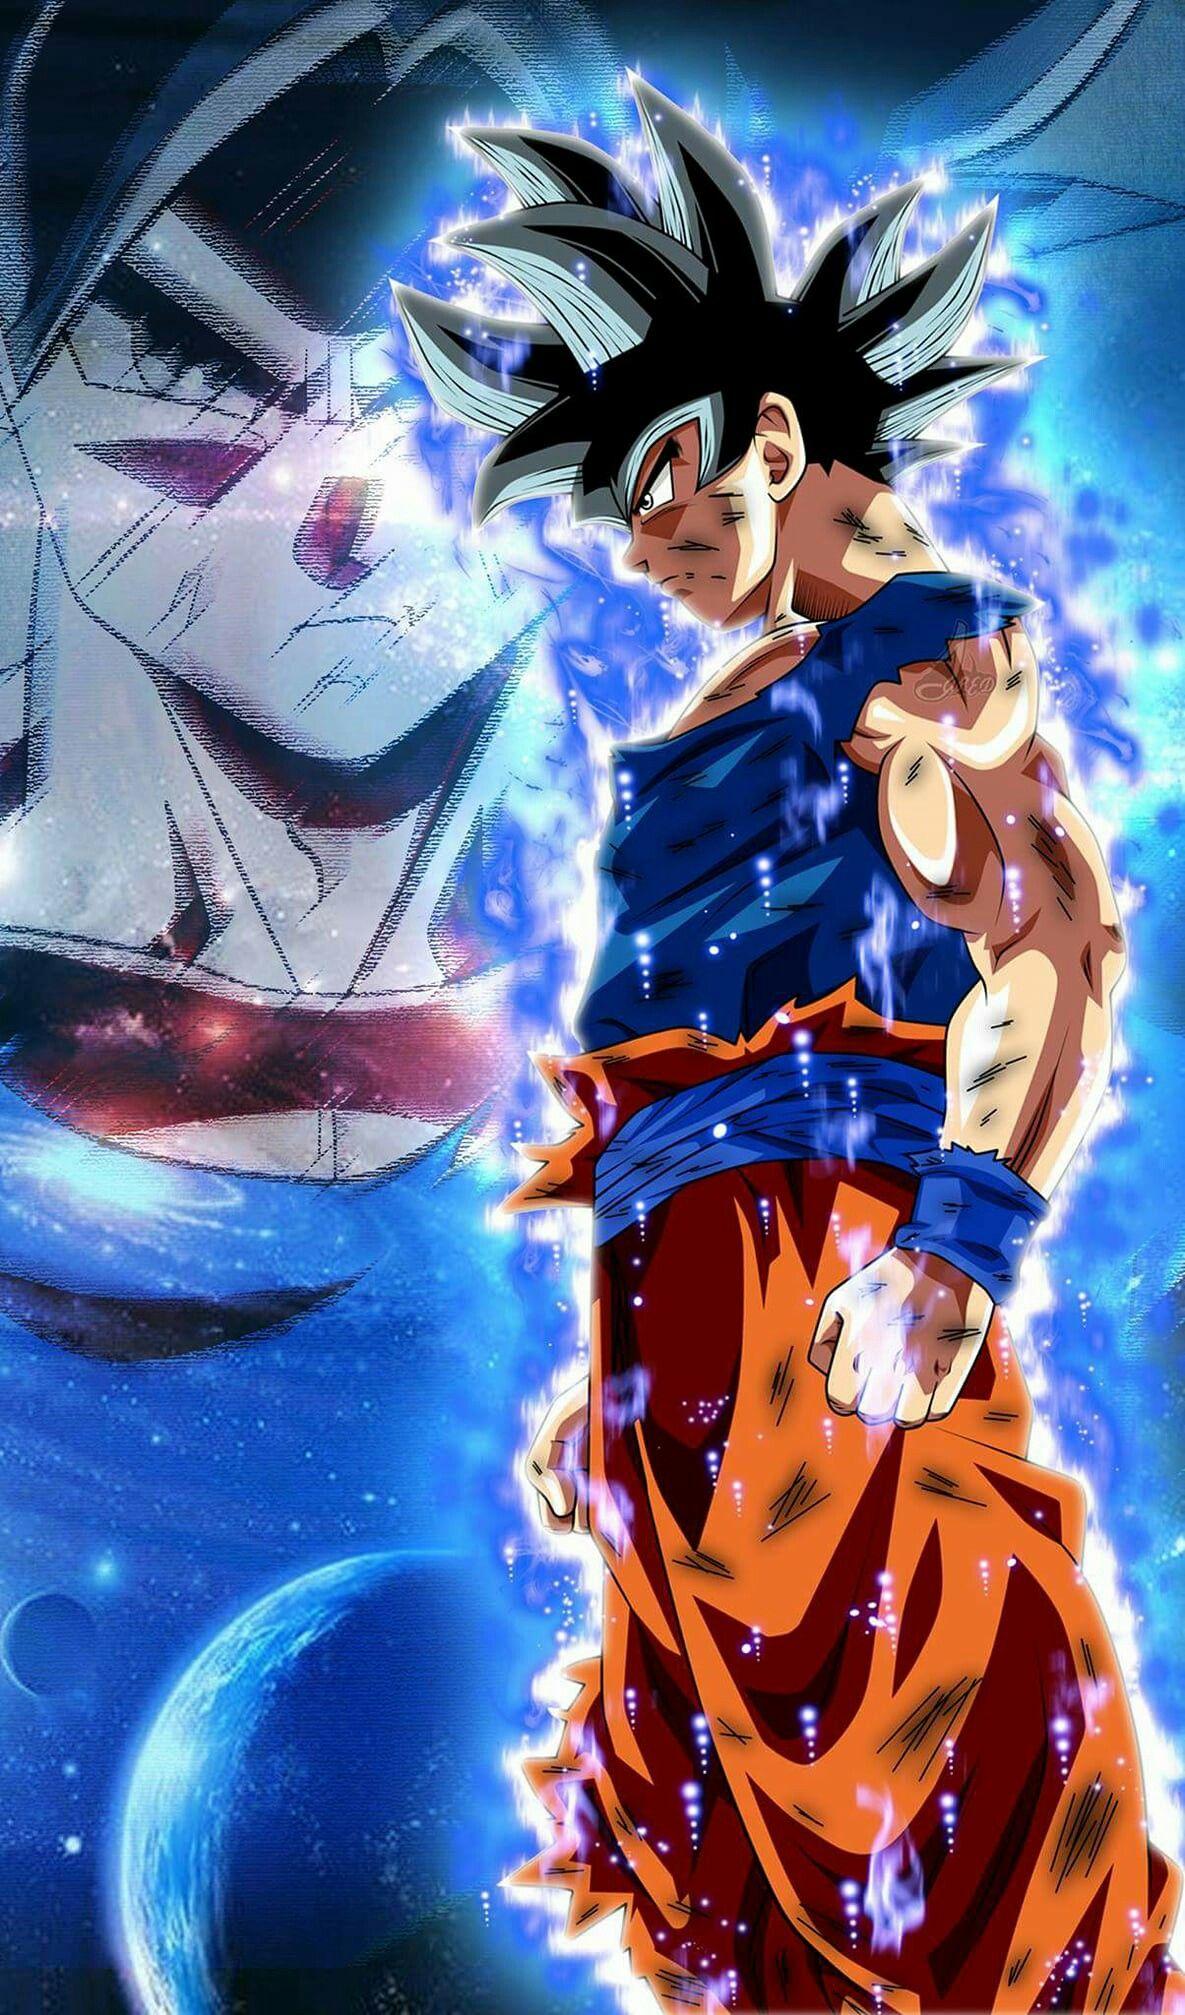 AWESOME Ultra Instinct Dragon Ball ZGTSUPER 1185x2015